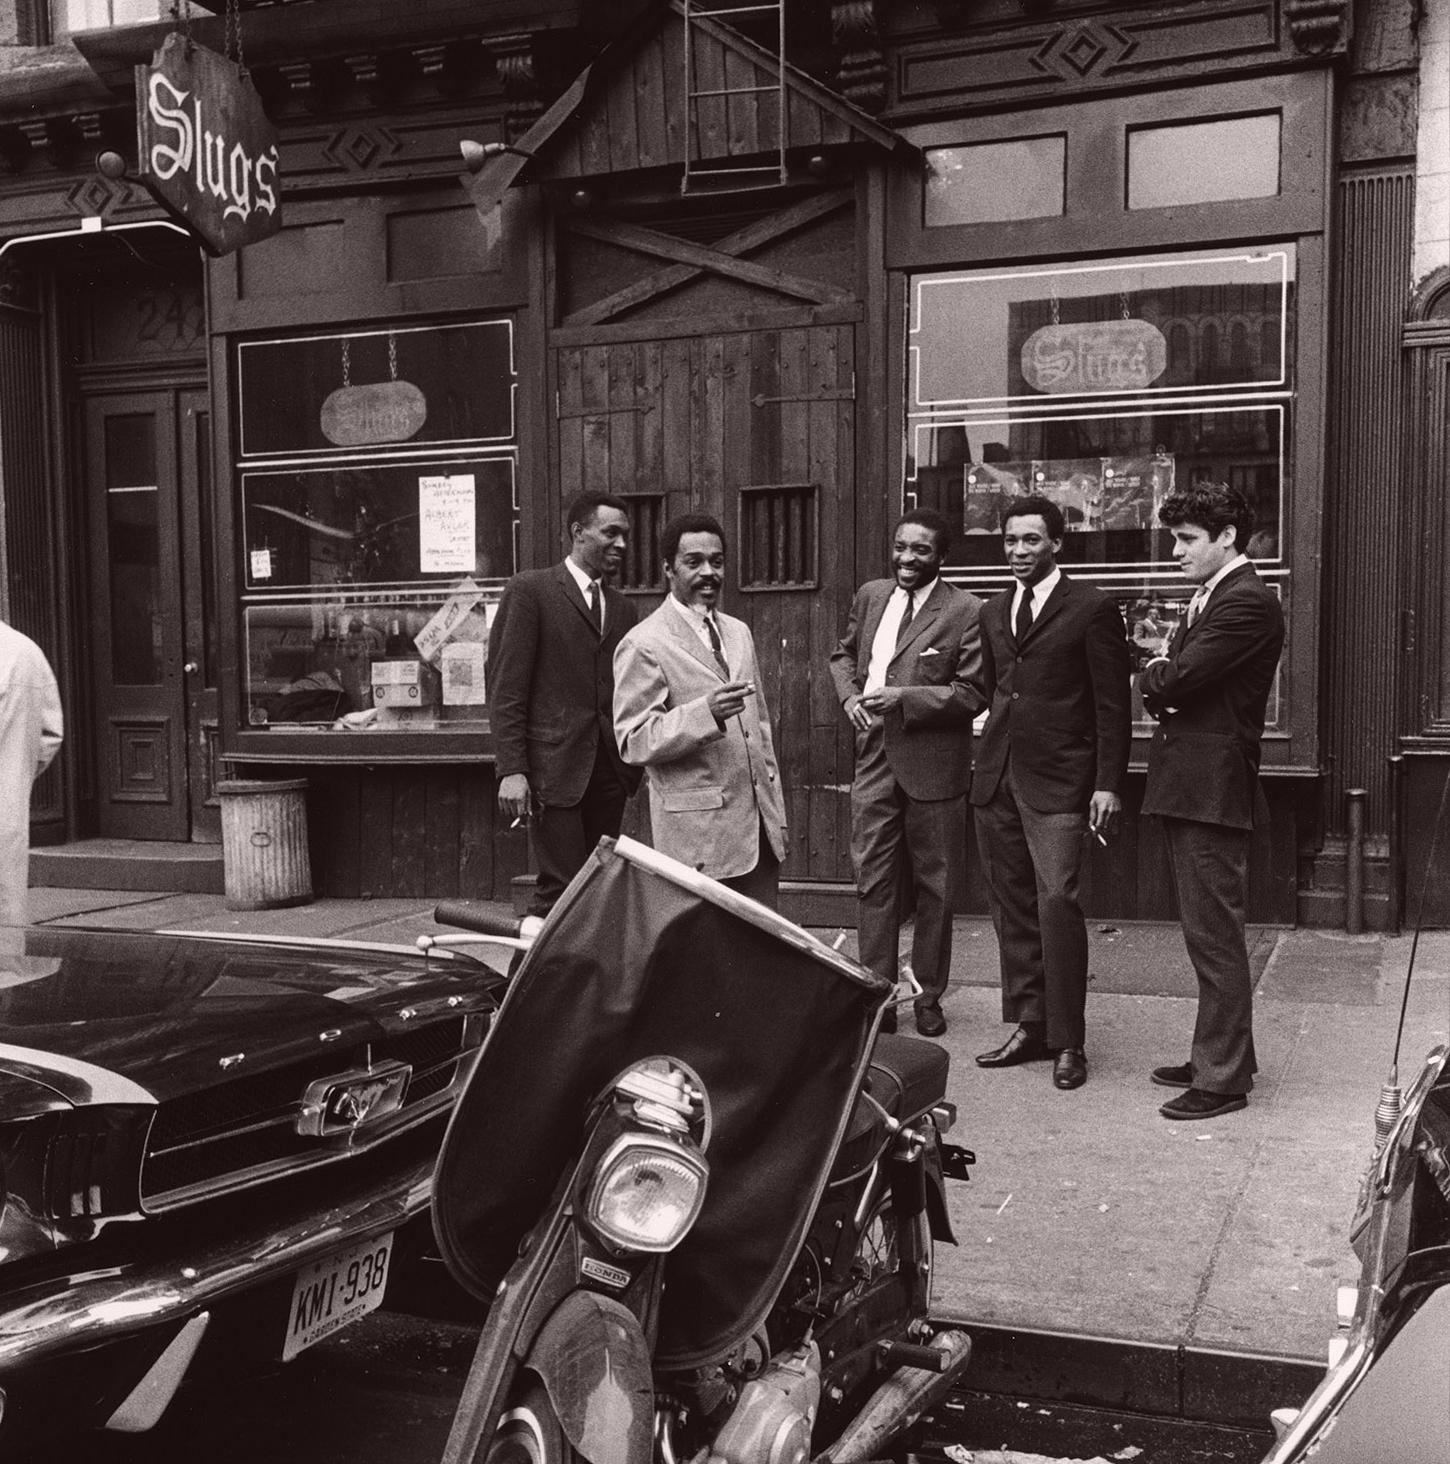 Albert Ayler Quintet Live at Slug's